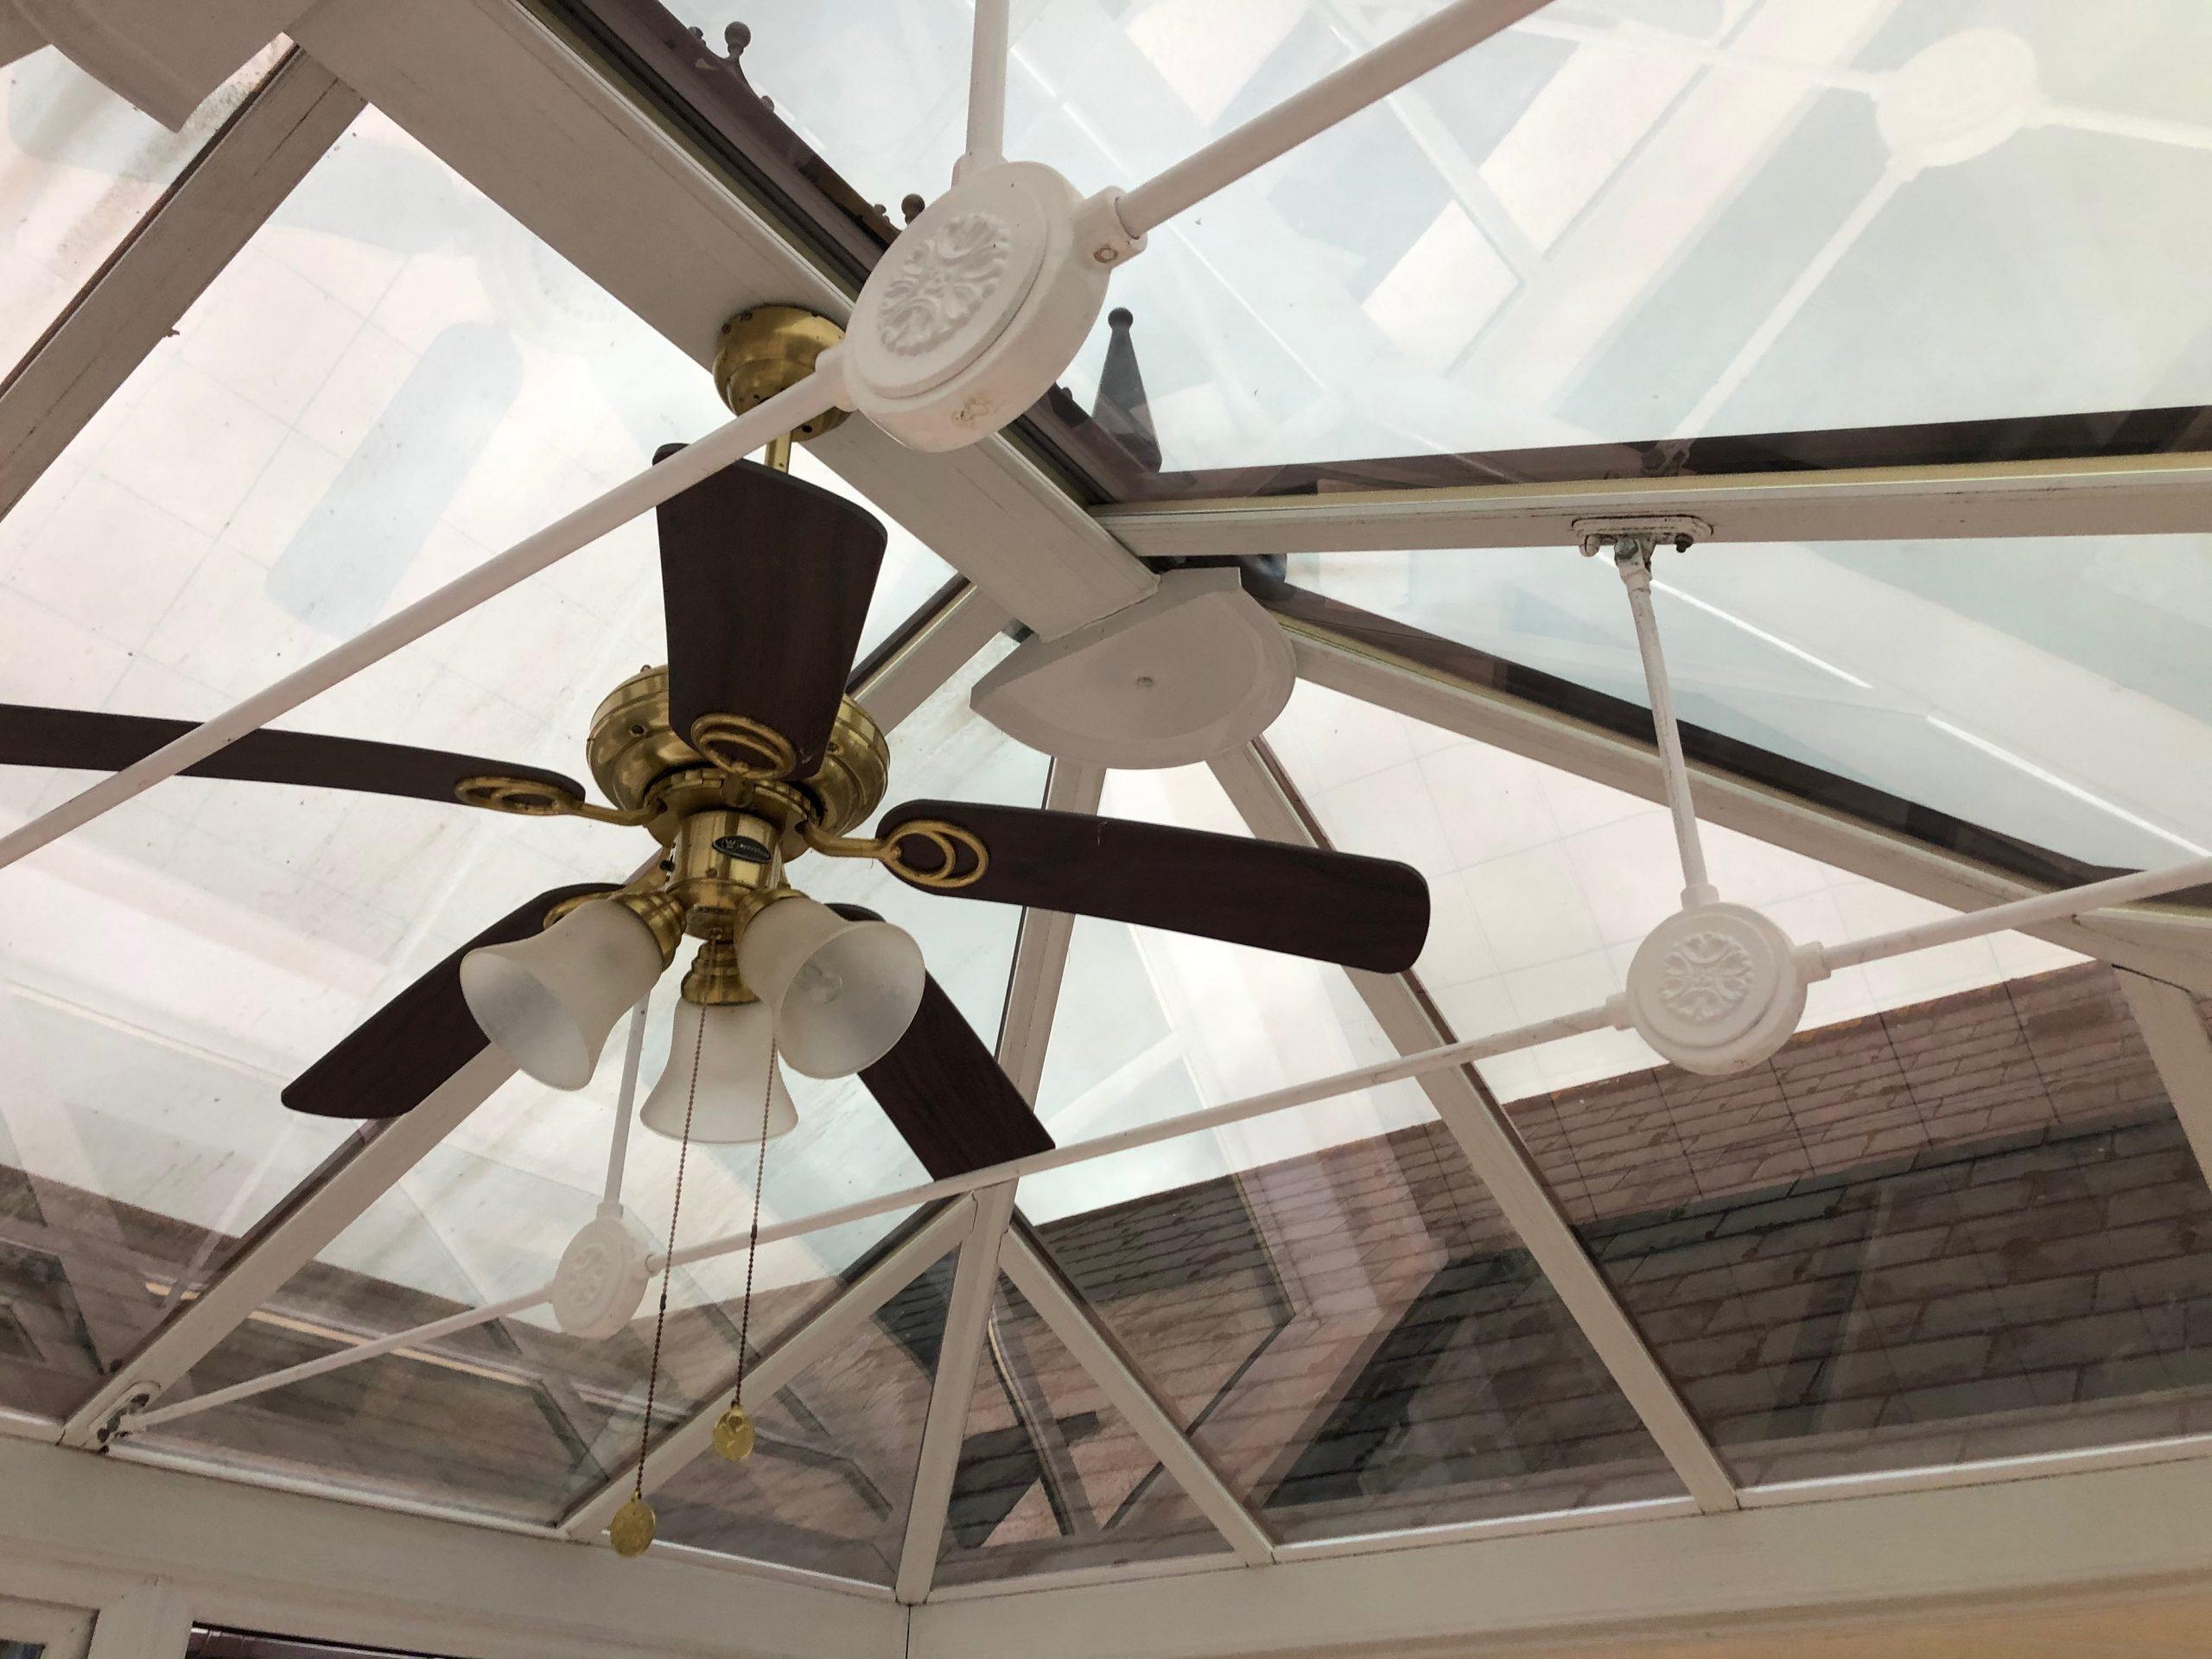 Bronze Window Film for Heat and Glare Reduction